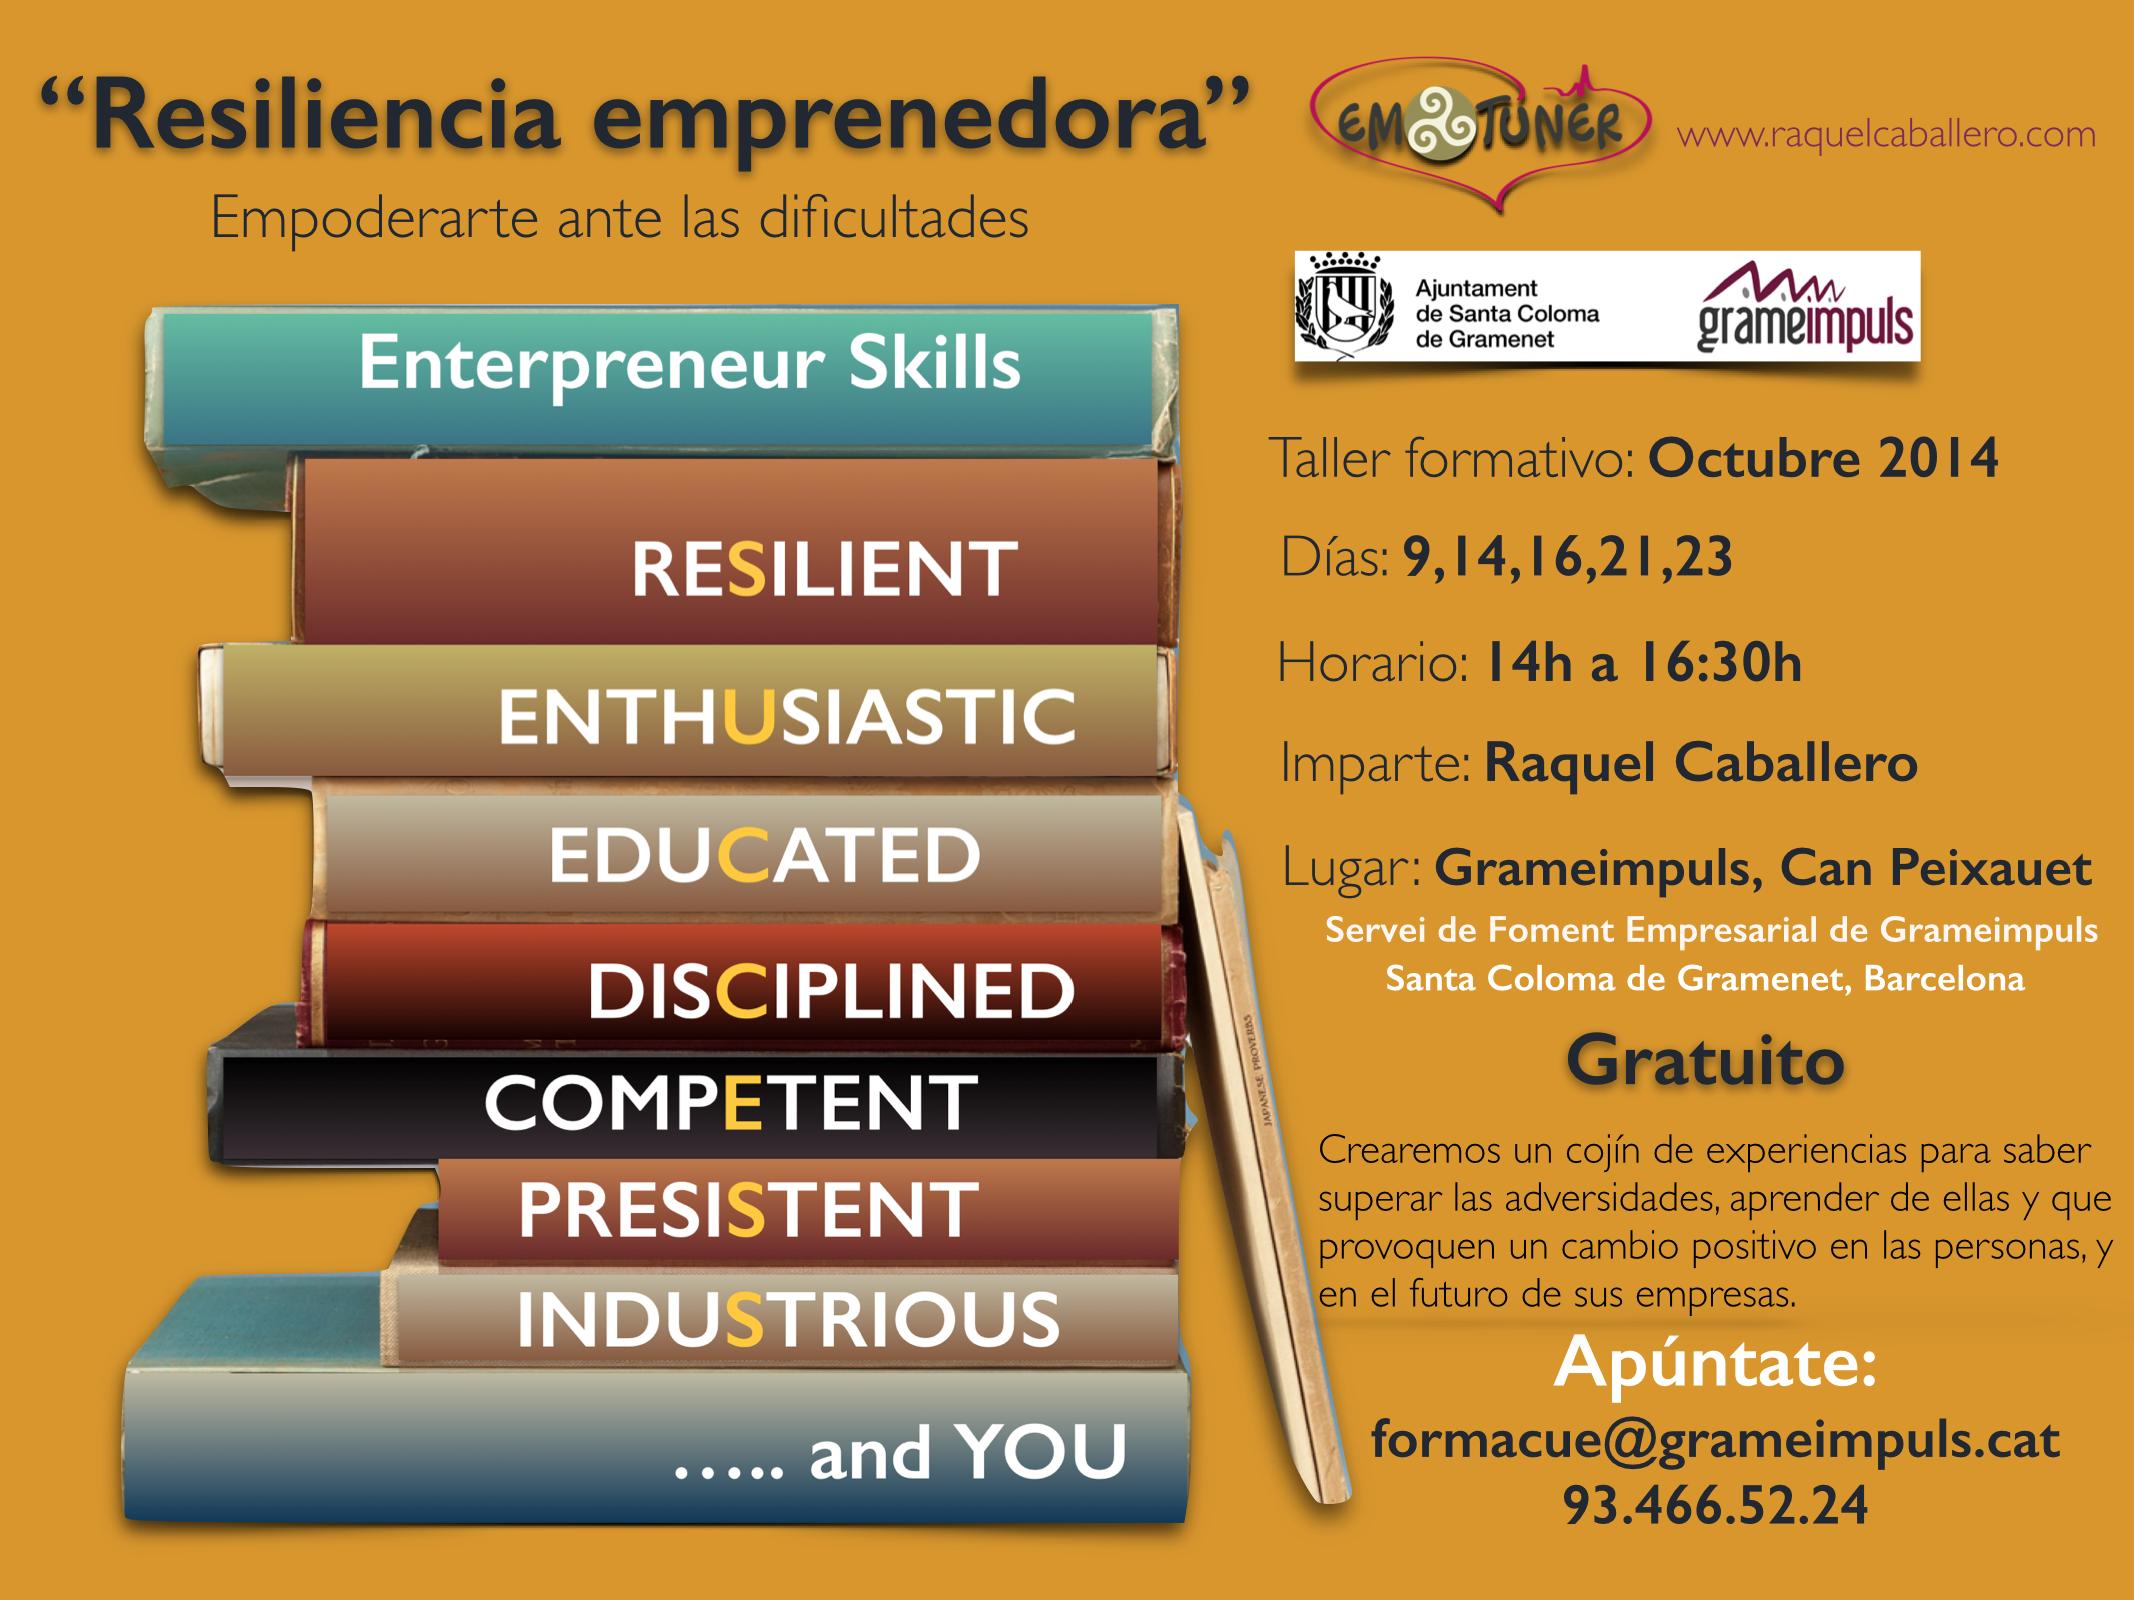 Resiliencia emprendedora-Emotuner-Grameimpuls (CAST)